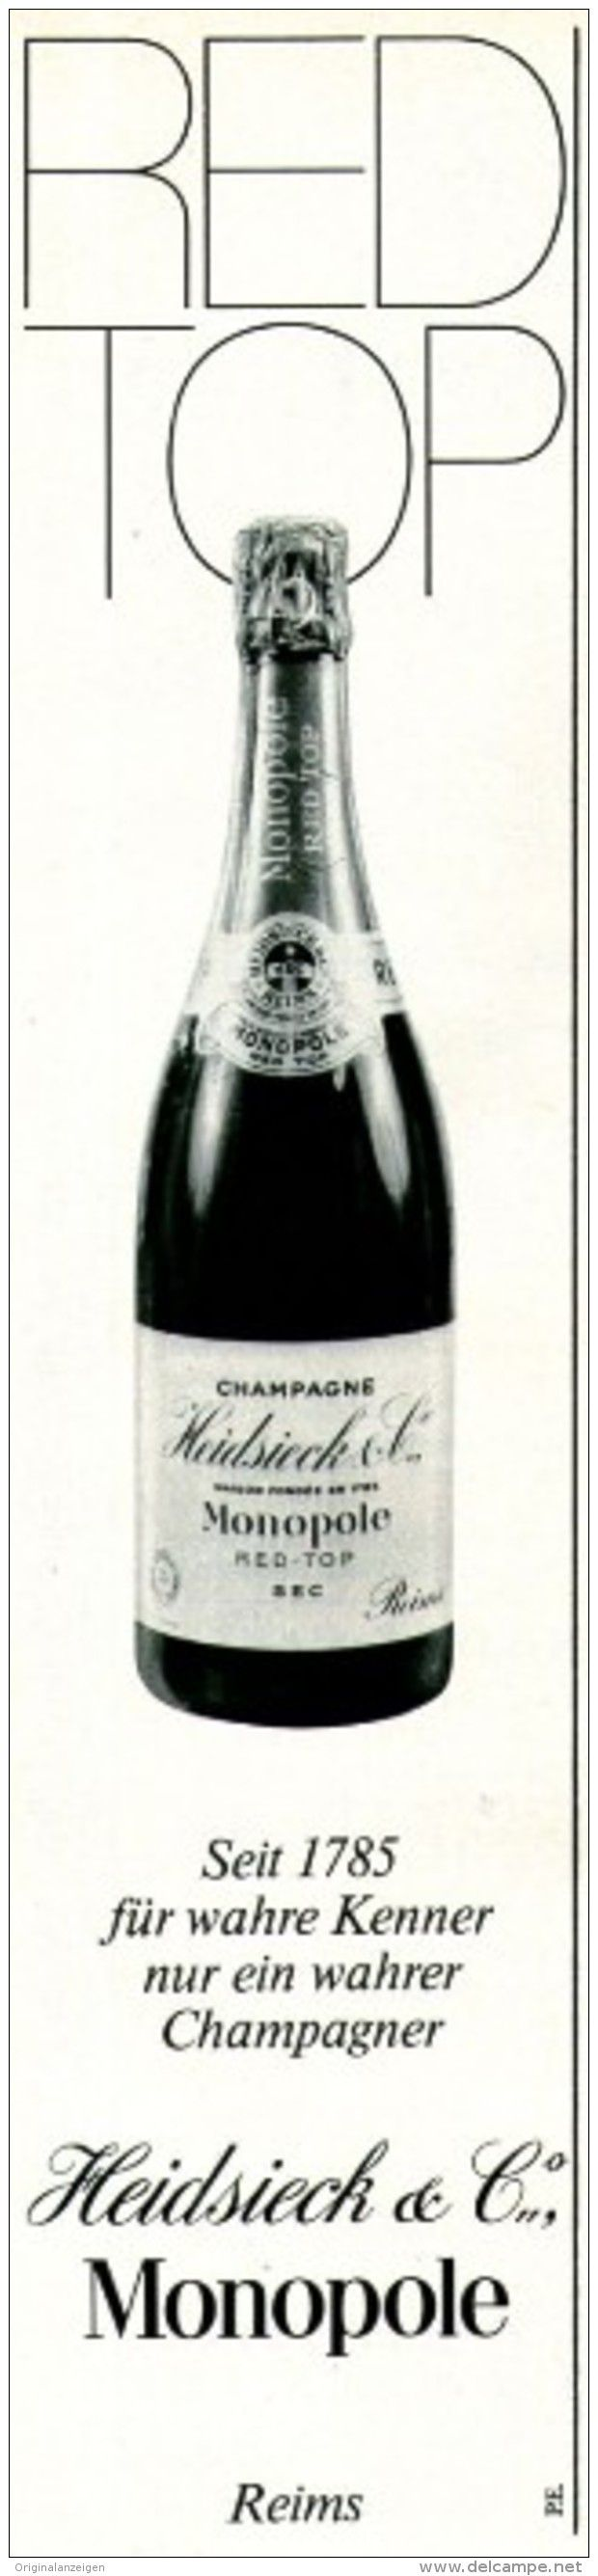 Original-Werbung/ Anzeige 1969 - HEIDSIECK MONOPOLE CHAMPAGNER - ca. 55 x 240 mm